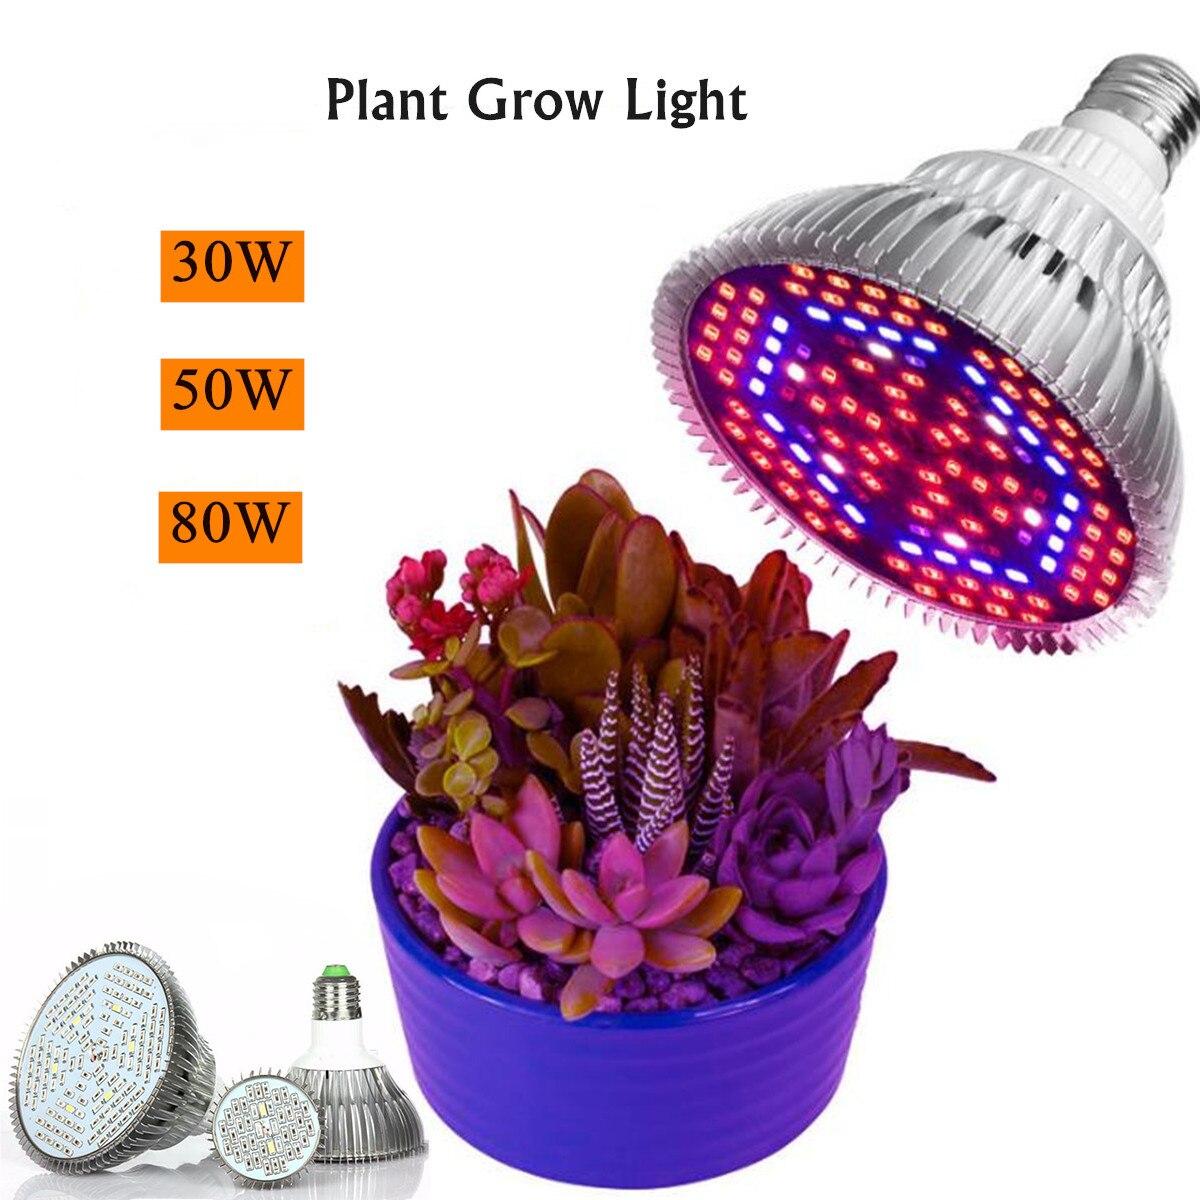 Full Spectrum LED Grow Light 120LEDs Plant Lamp Led Bulb for Plants Aquarium Flowers Seeds Garden Vegetables Greenhouse E27(China)